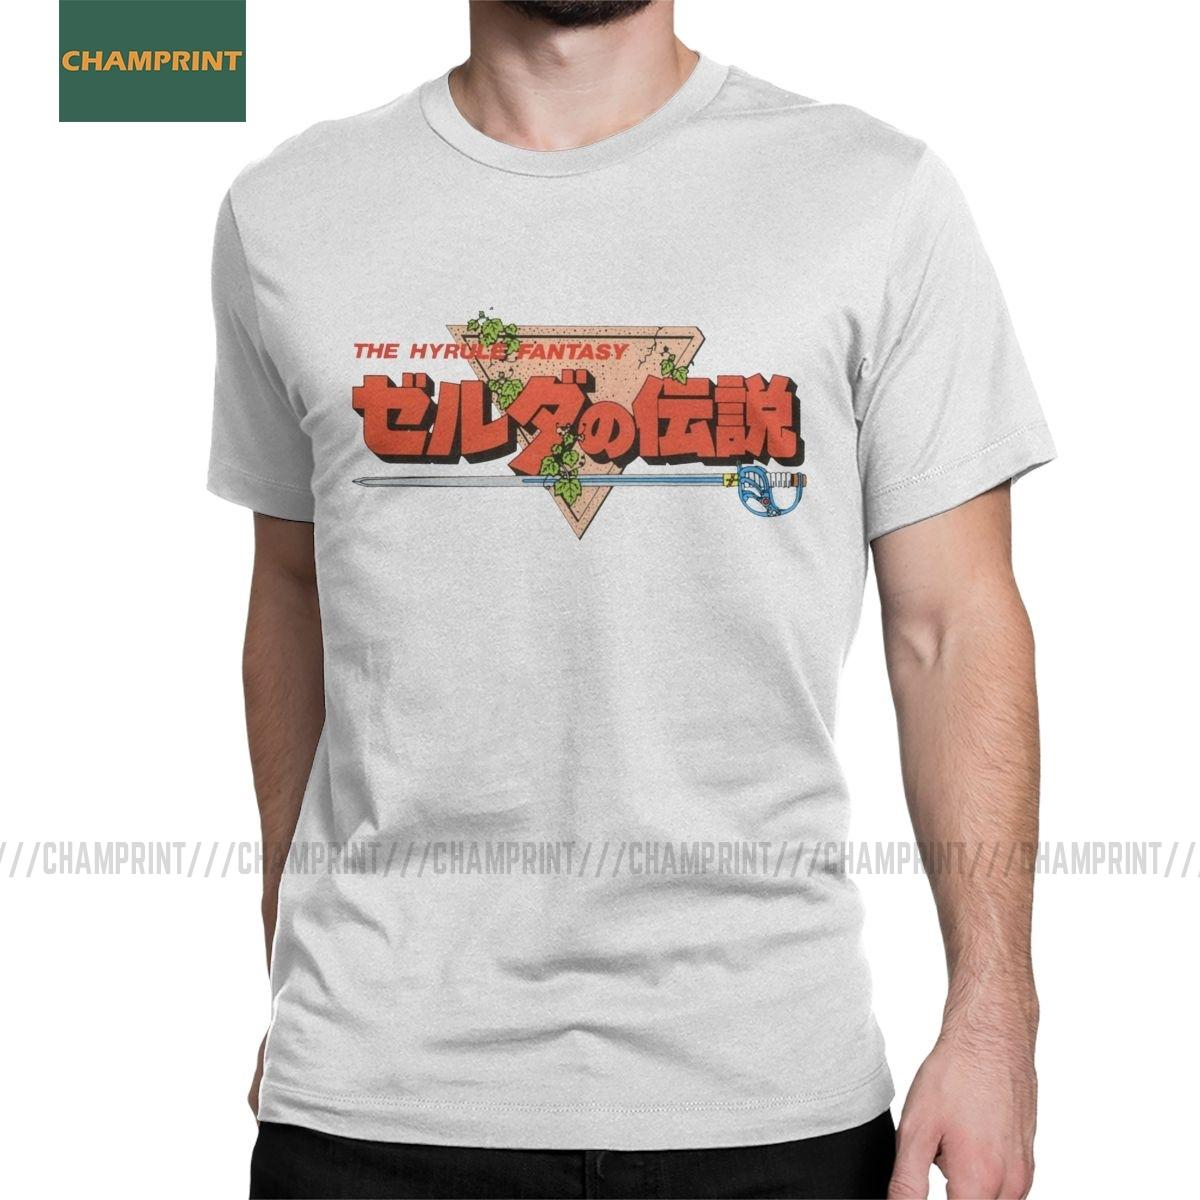 The Legend of Zelda giapponesi Logo magliette da uomo in cotone T-shirt Toon Stained Glass Hyrule gioco Ganon Tee Shirt manica corta